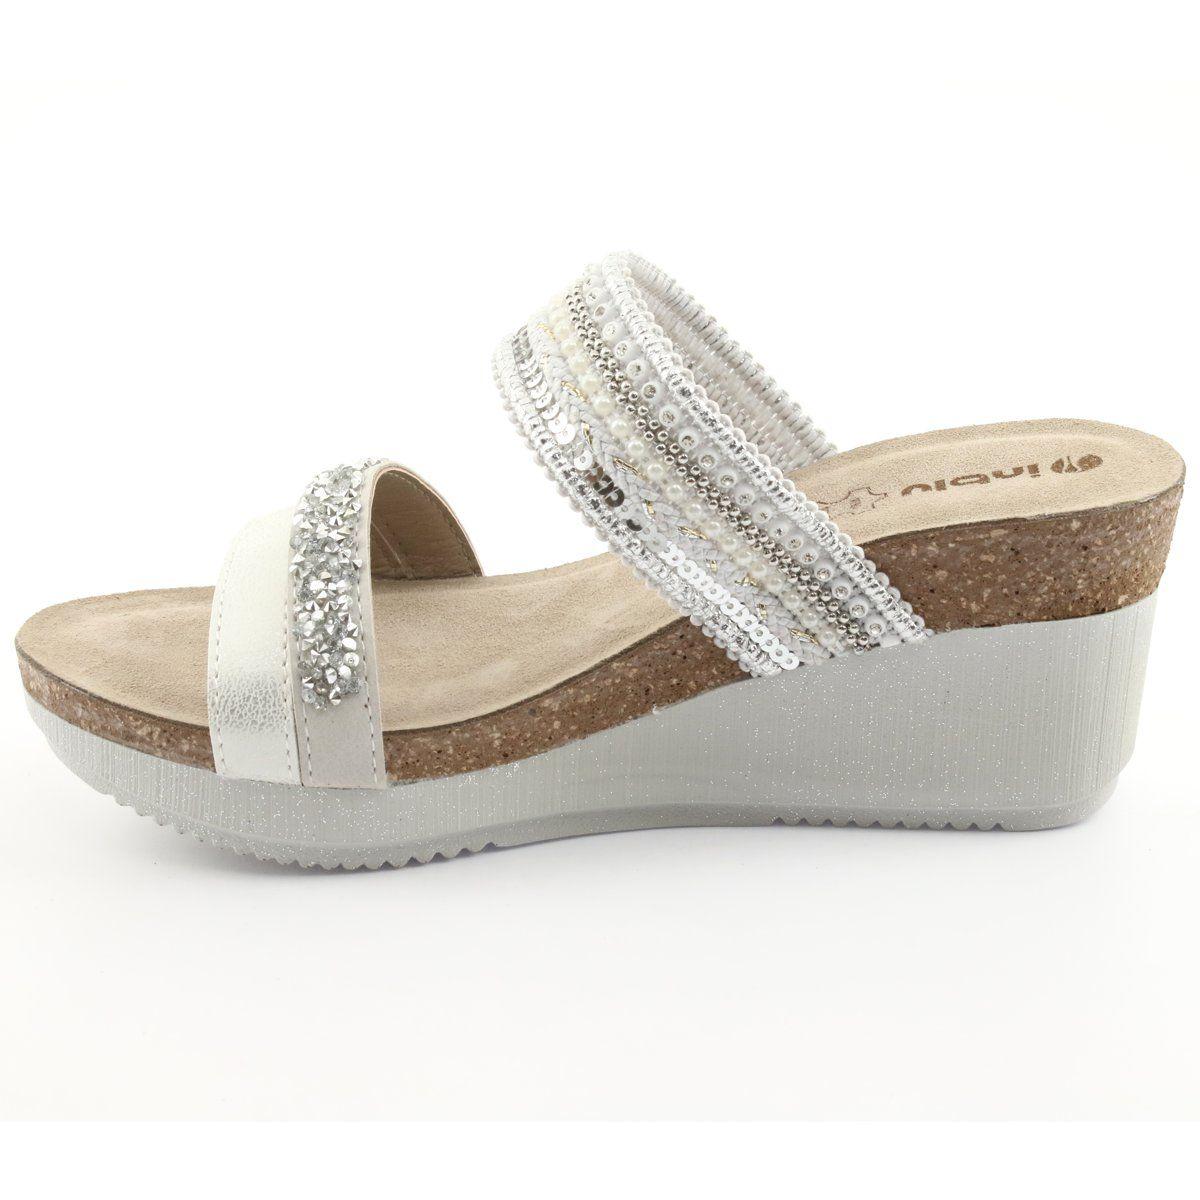 Klapki Na Koturnie Inblu En010 Srebrzyste Biale Szare Shoes Espadrilles Sandals